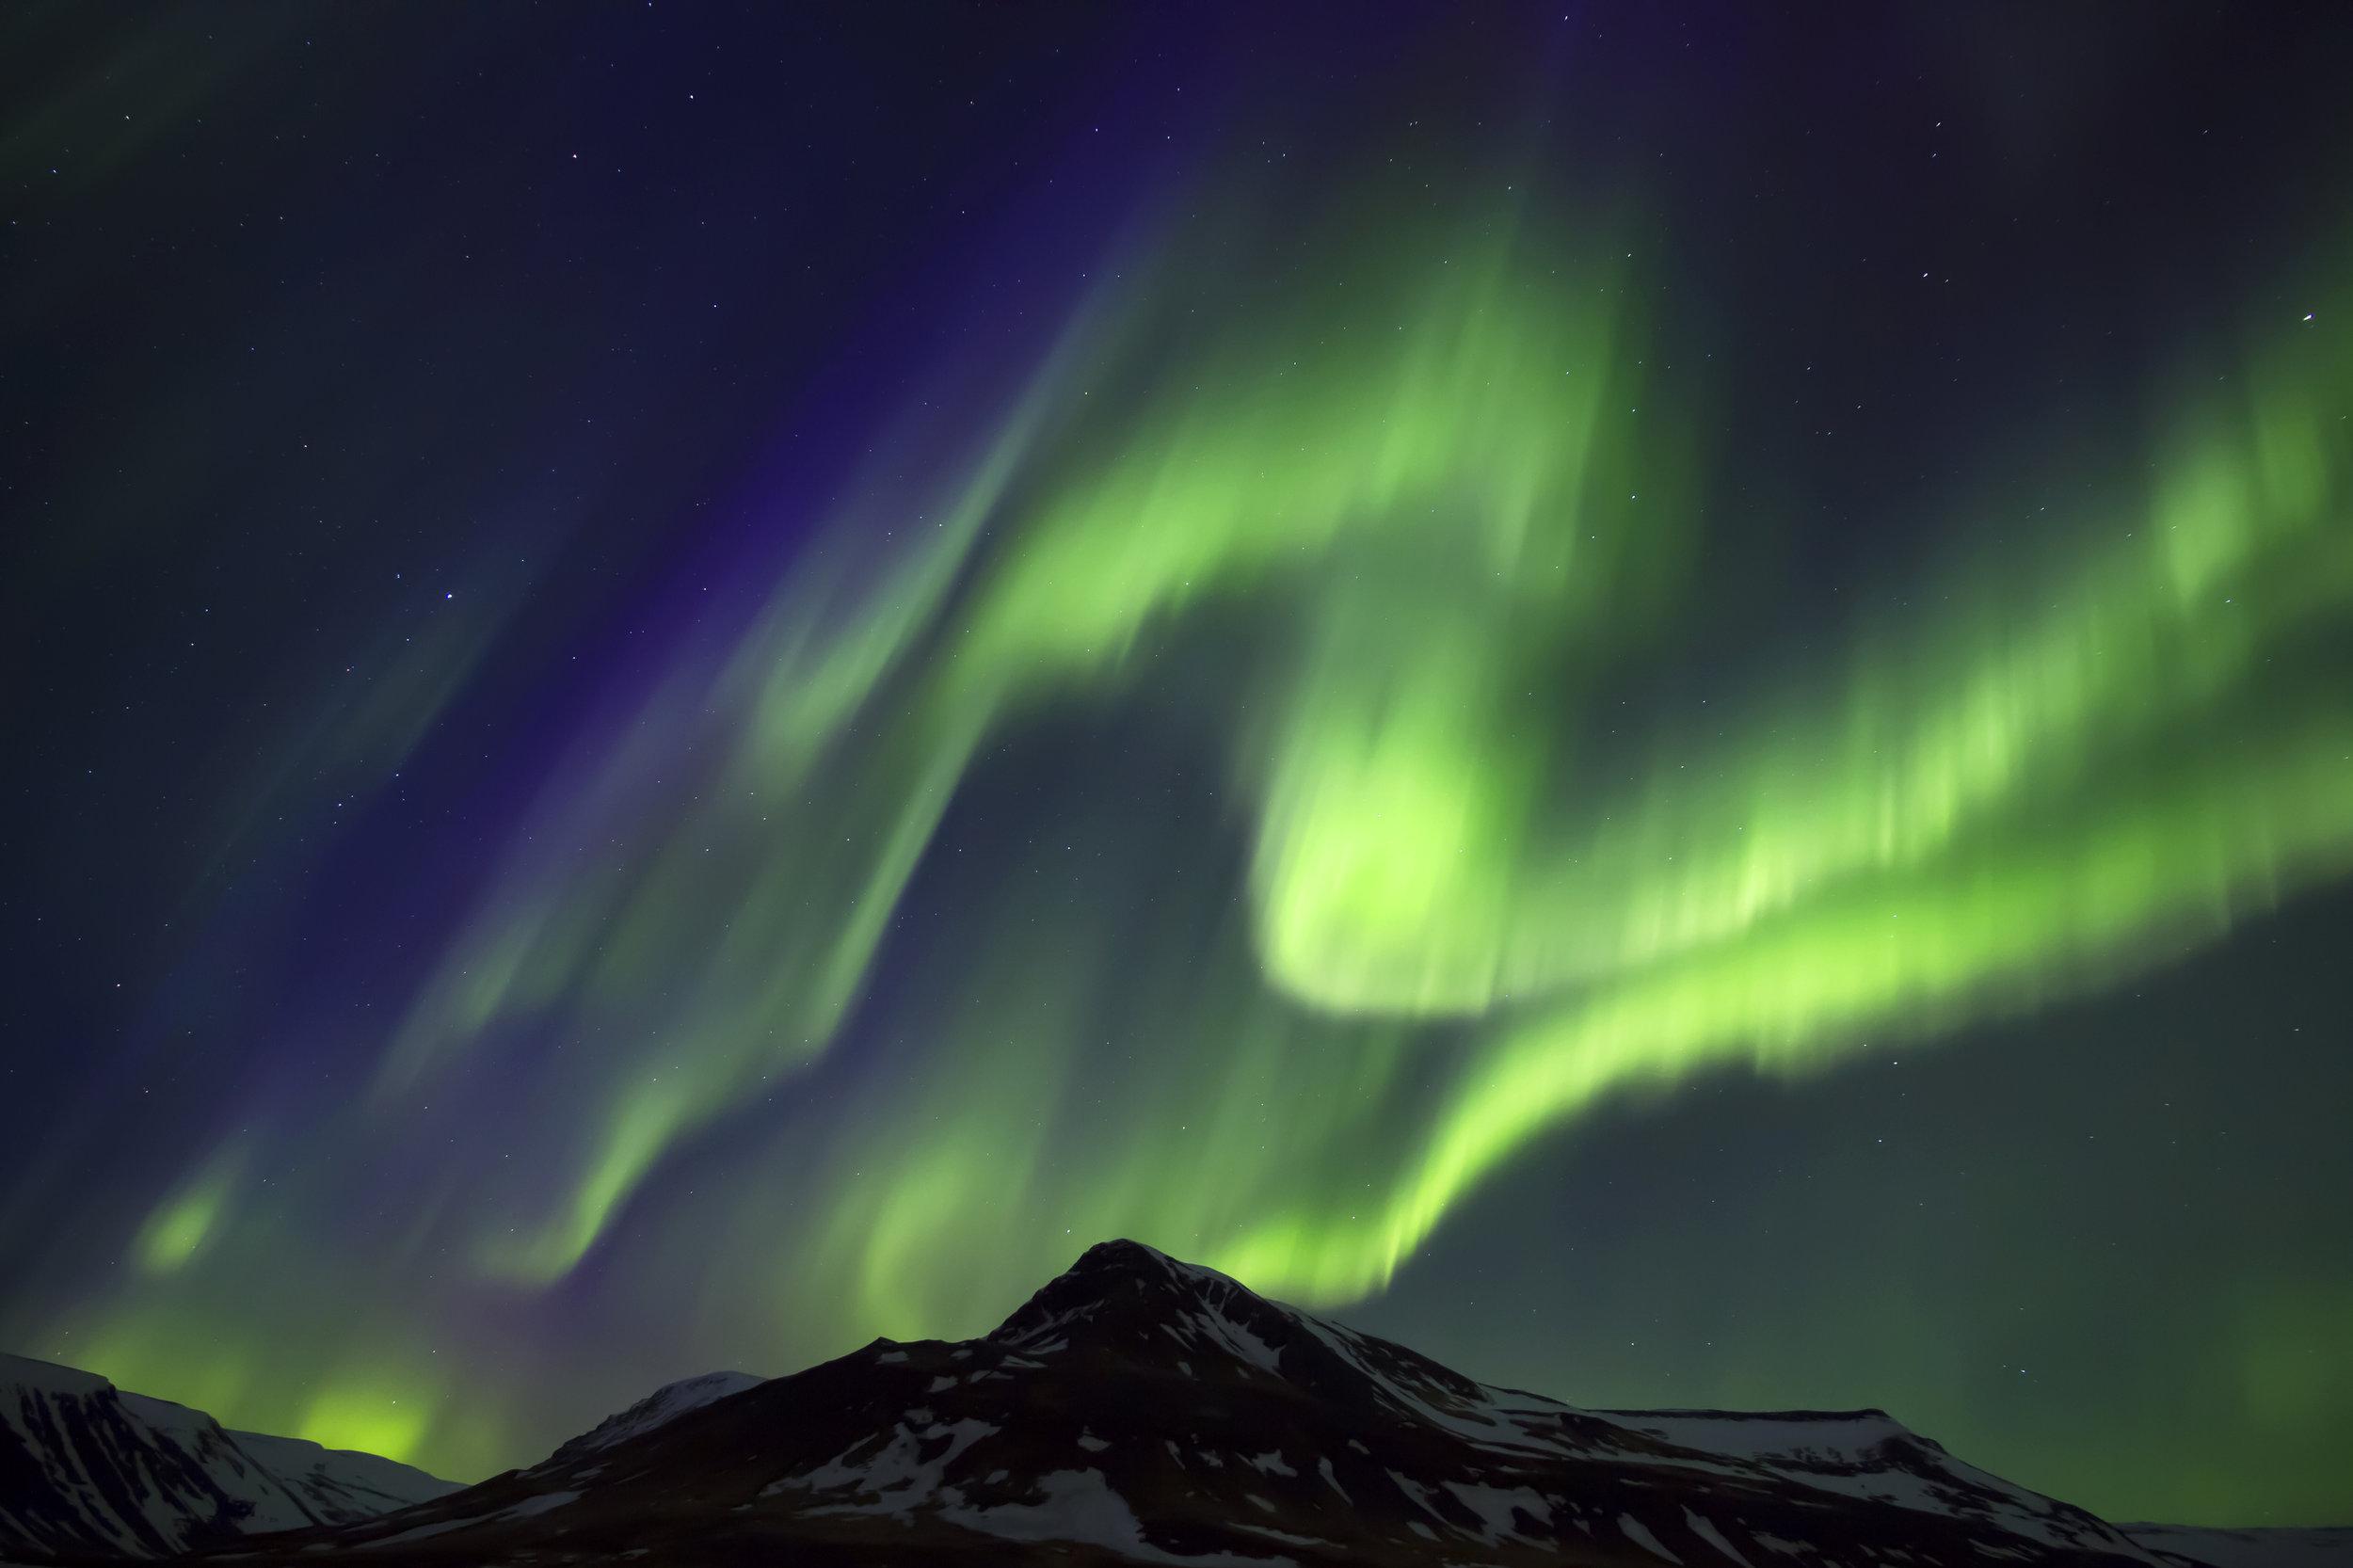 Northern_Lights_Swedish_Lapland.jpg